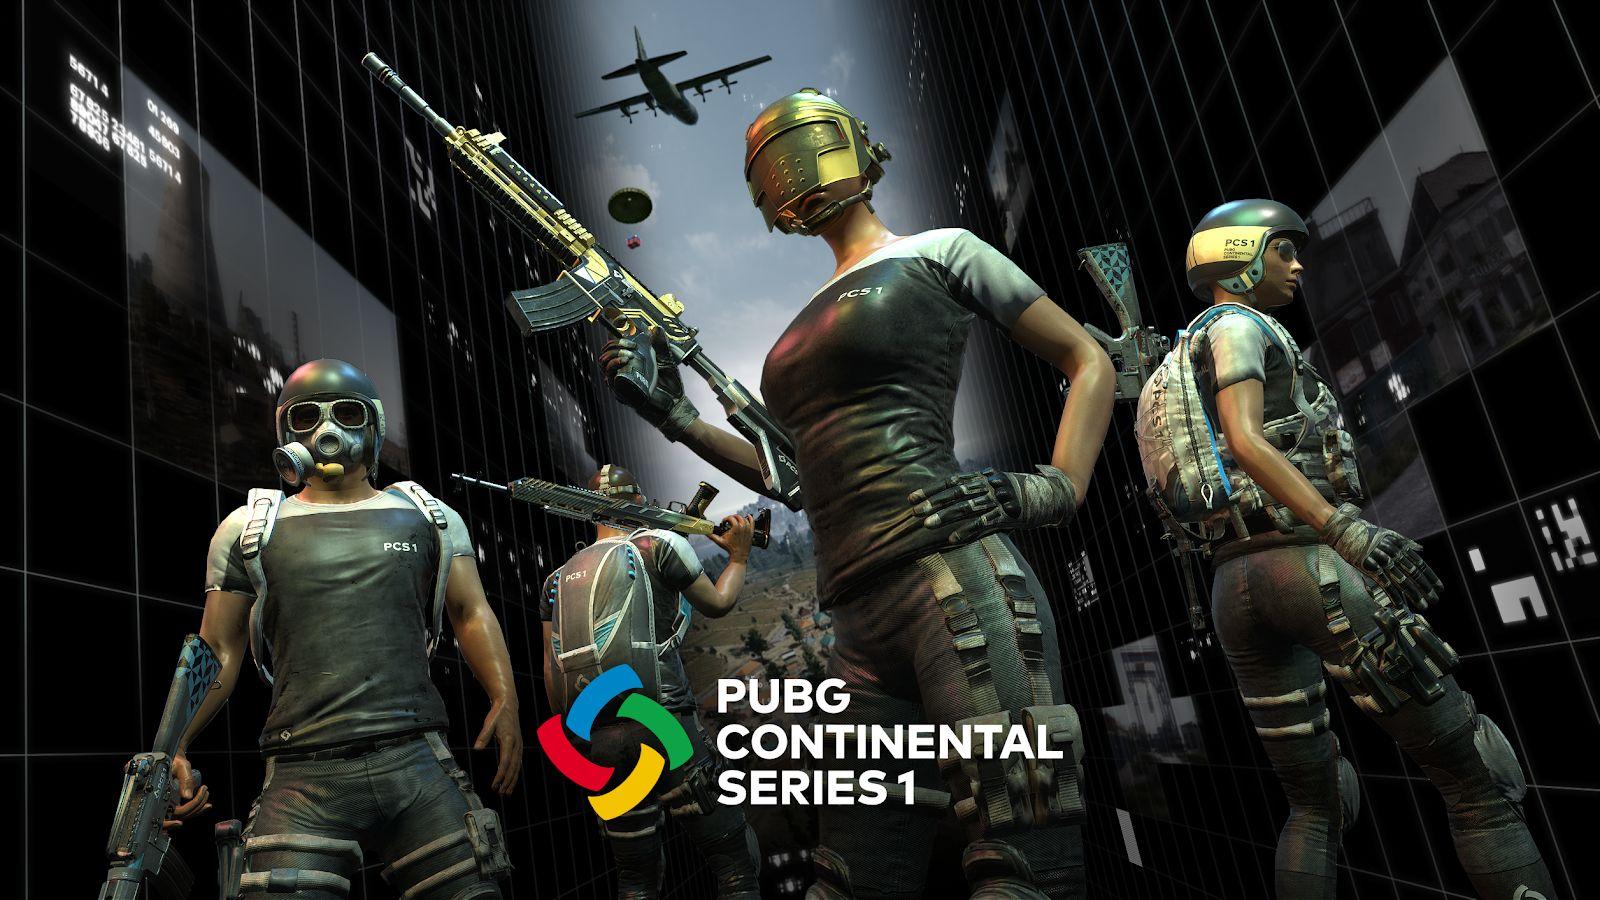 PUBG Esports представляет PCS 1 и PCS 2